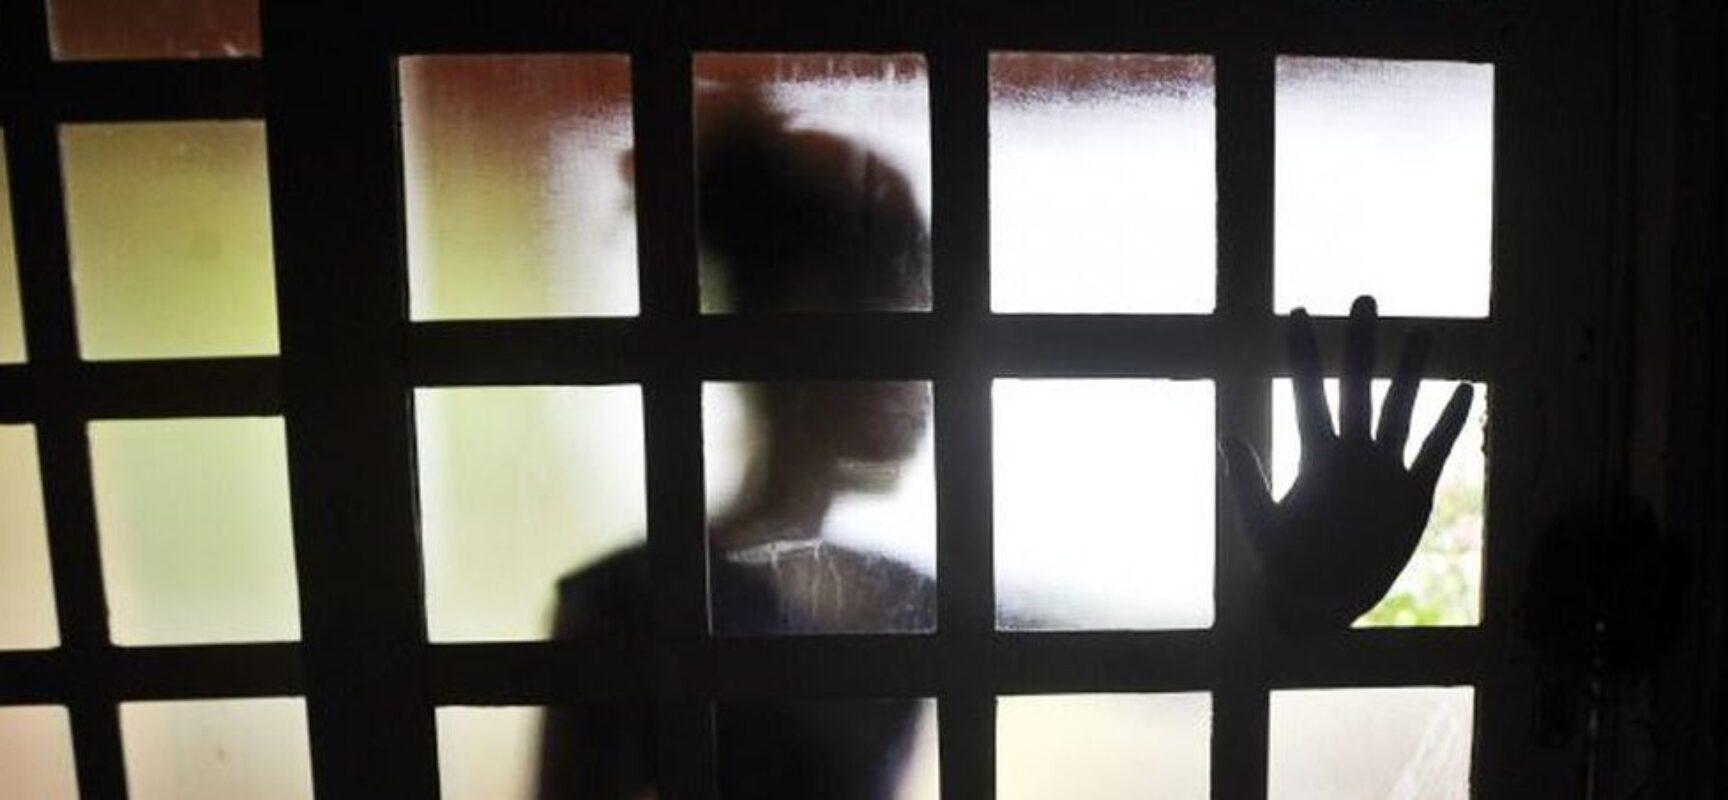 Abuso sexual infantil: como identificar, prevenir e combater